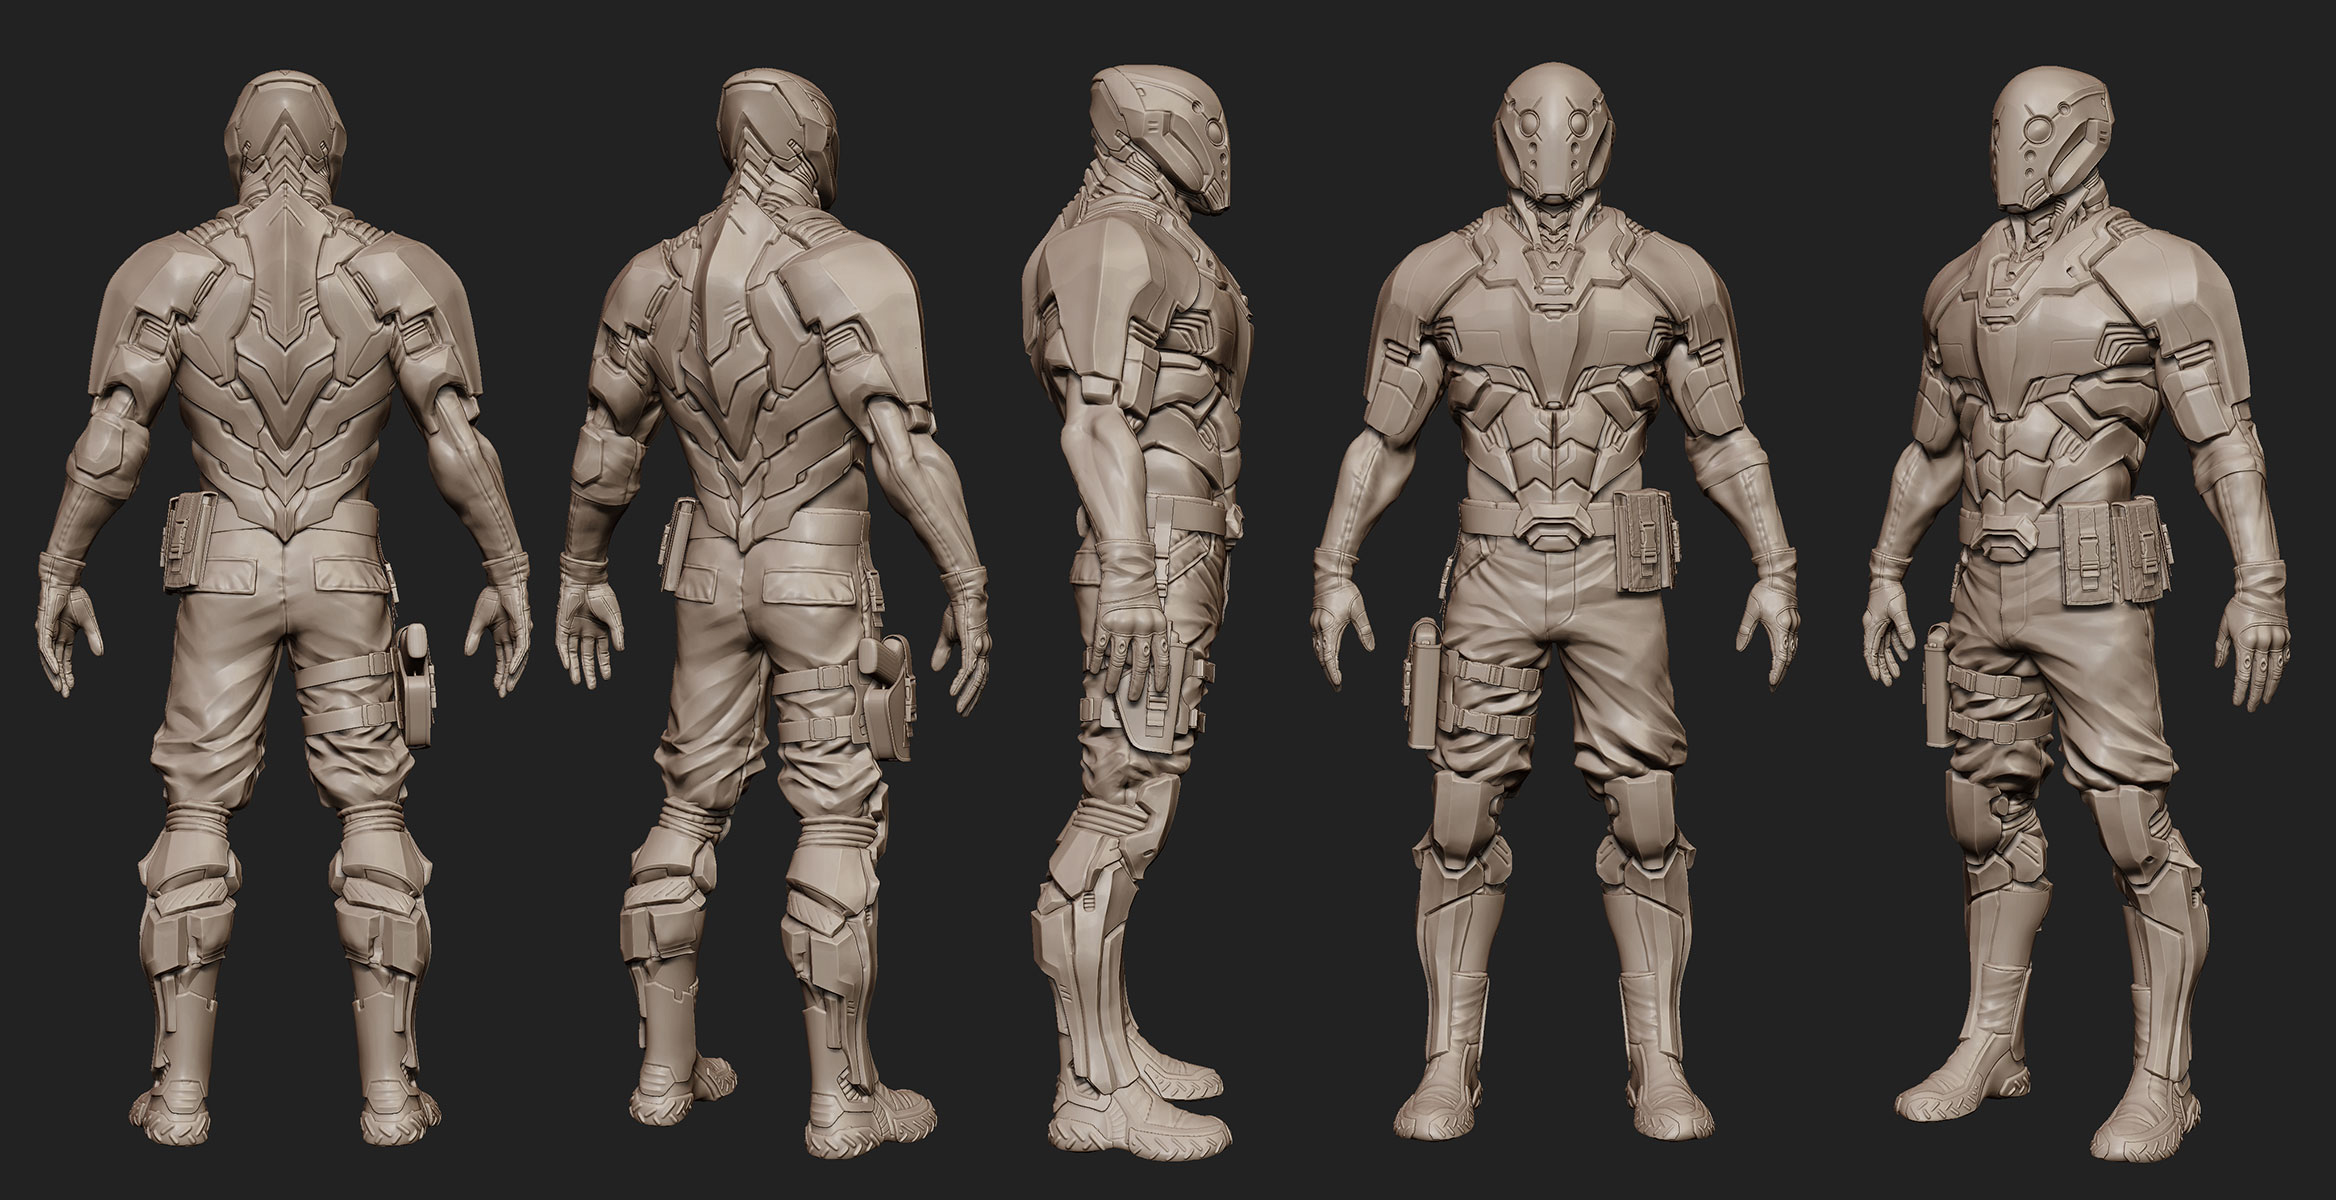 Cyborg Soldier Concept Art